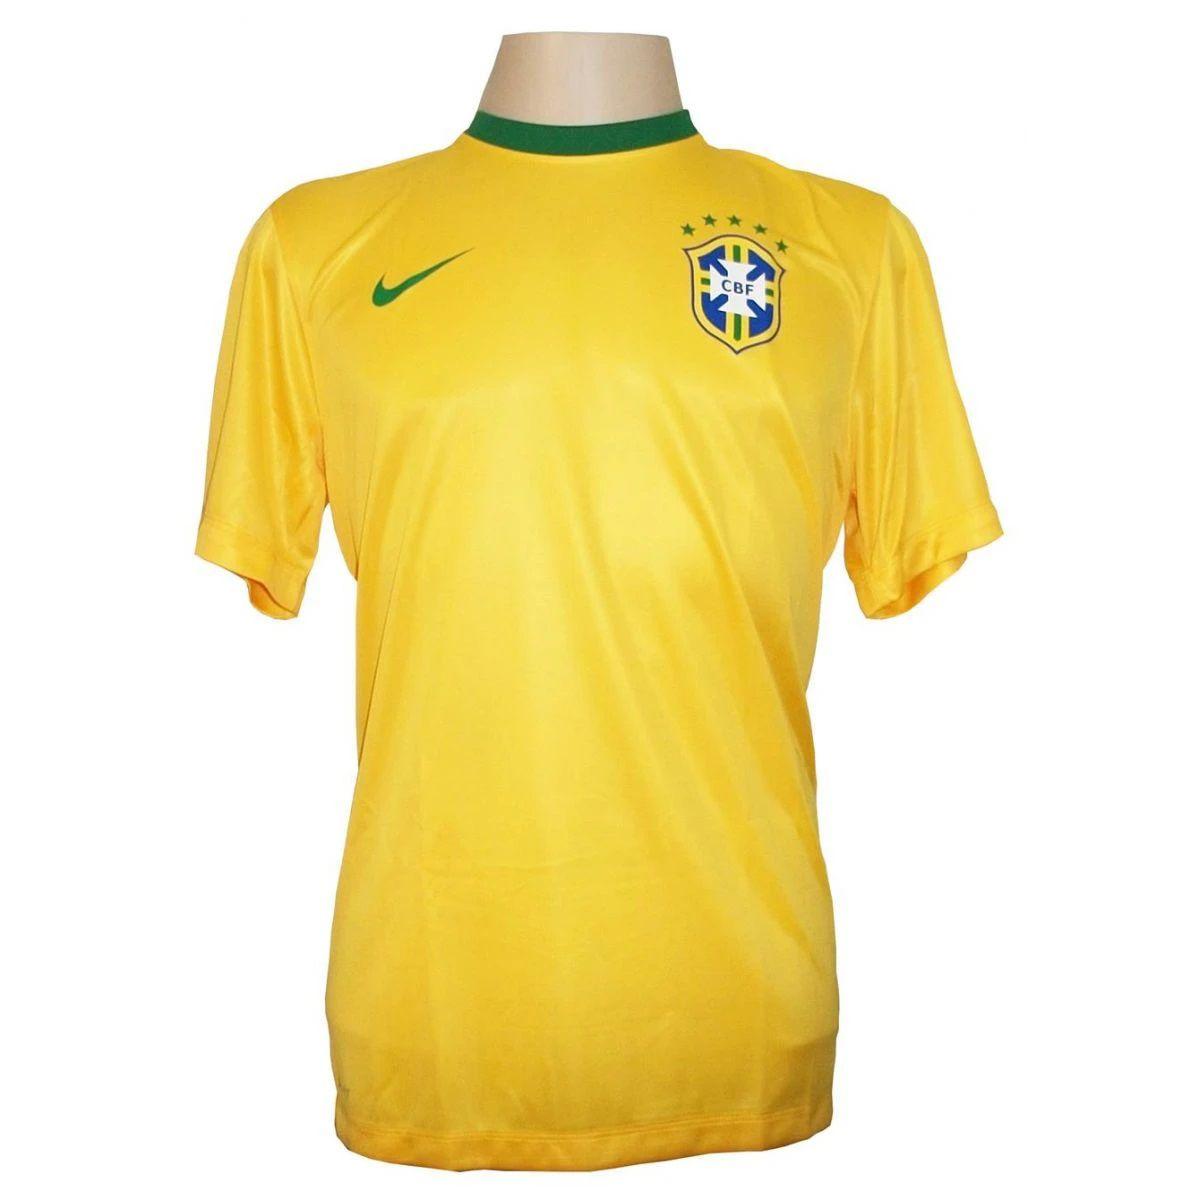 Camisa Brasil Home Adulto - Tecido Dri-fit - Nike